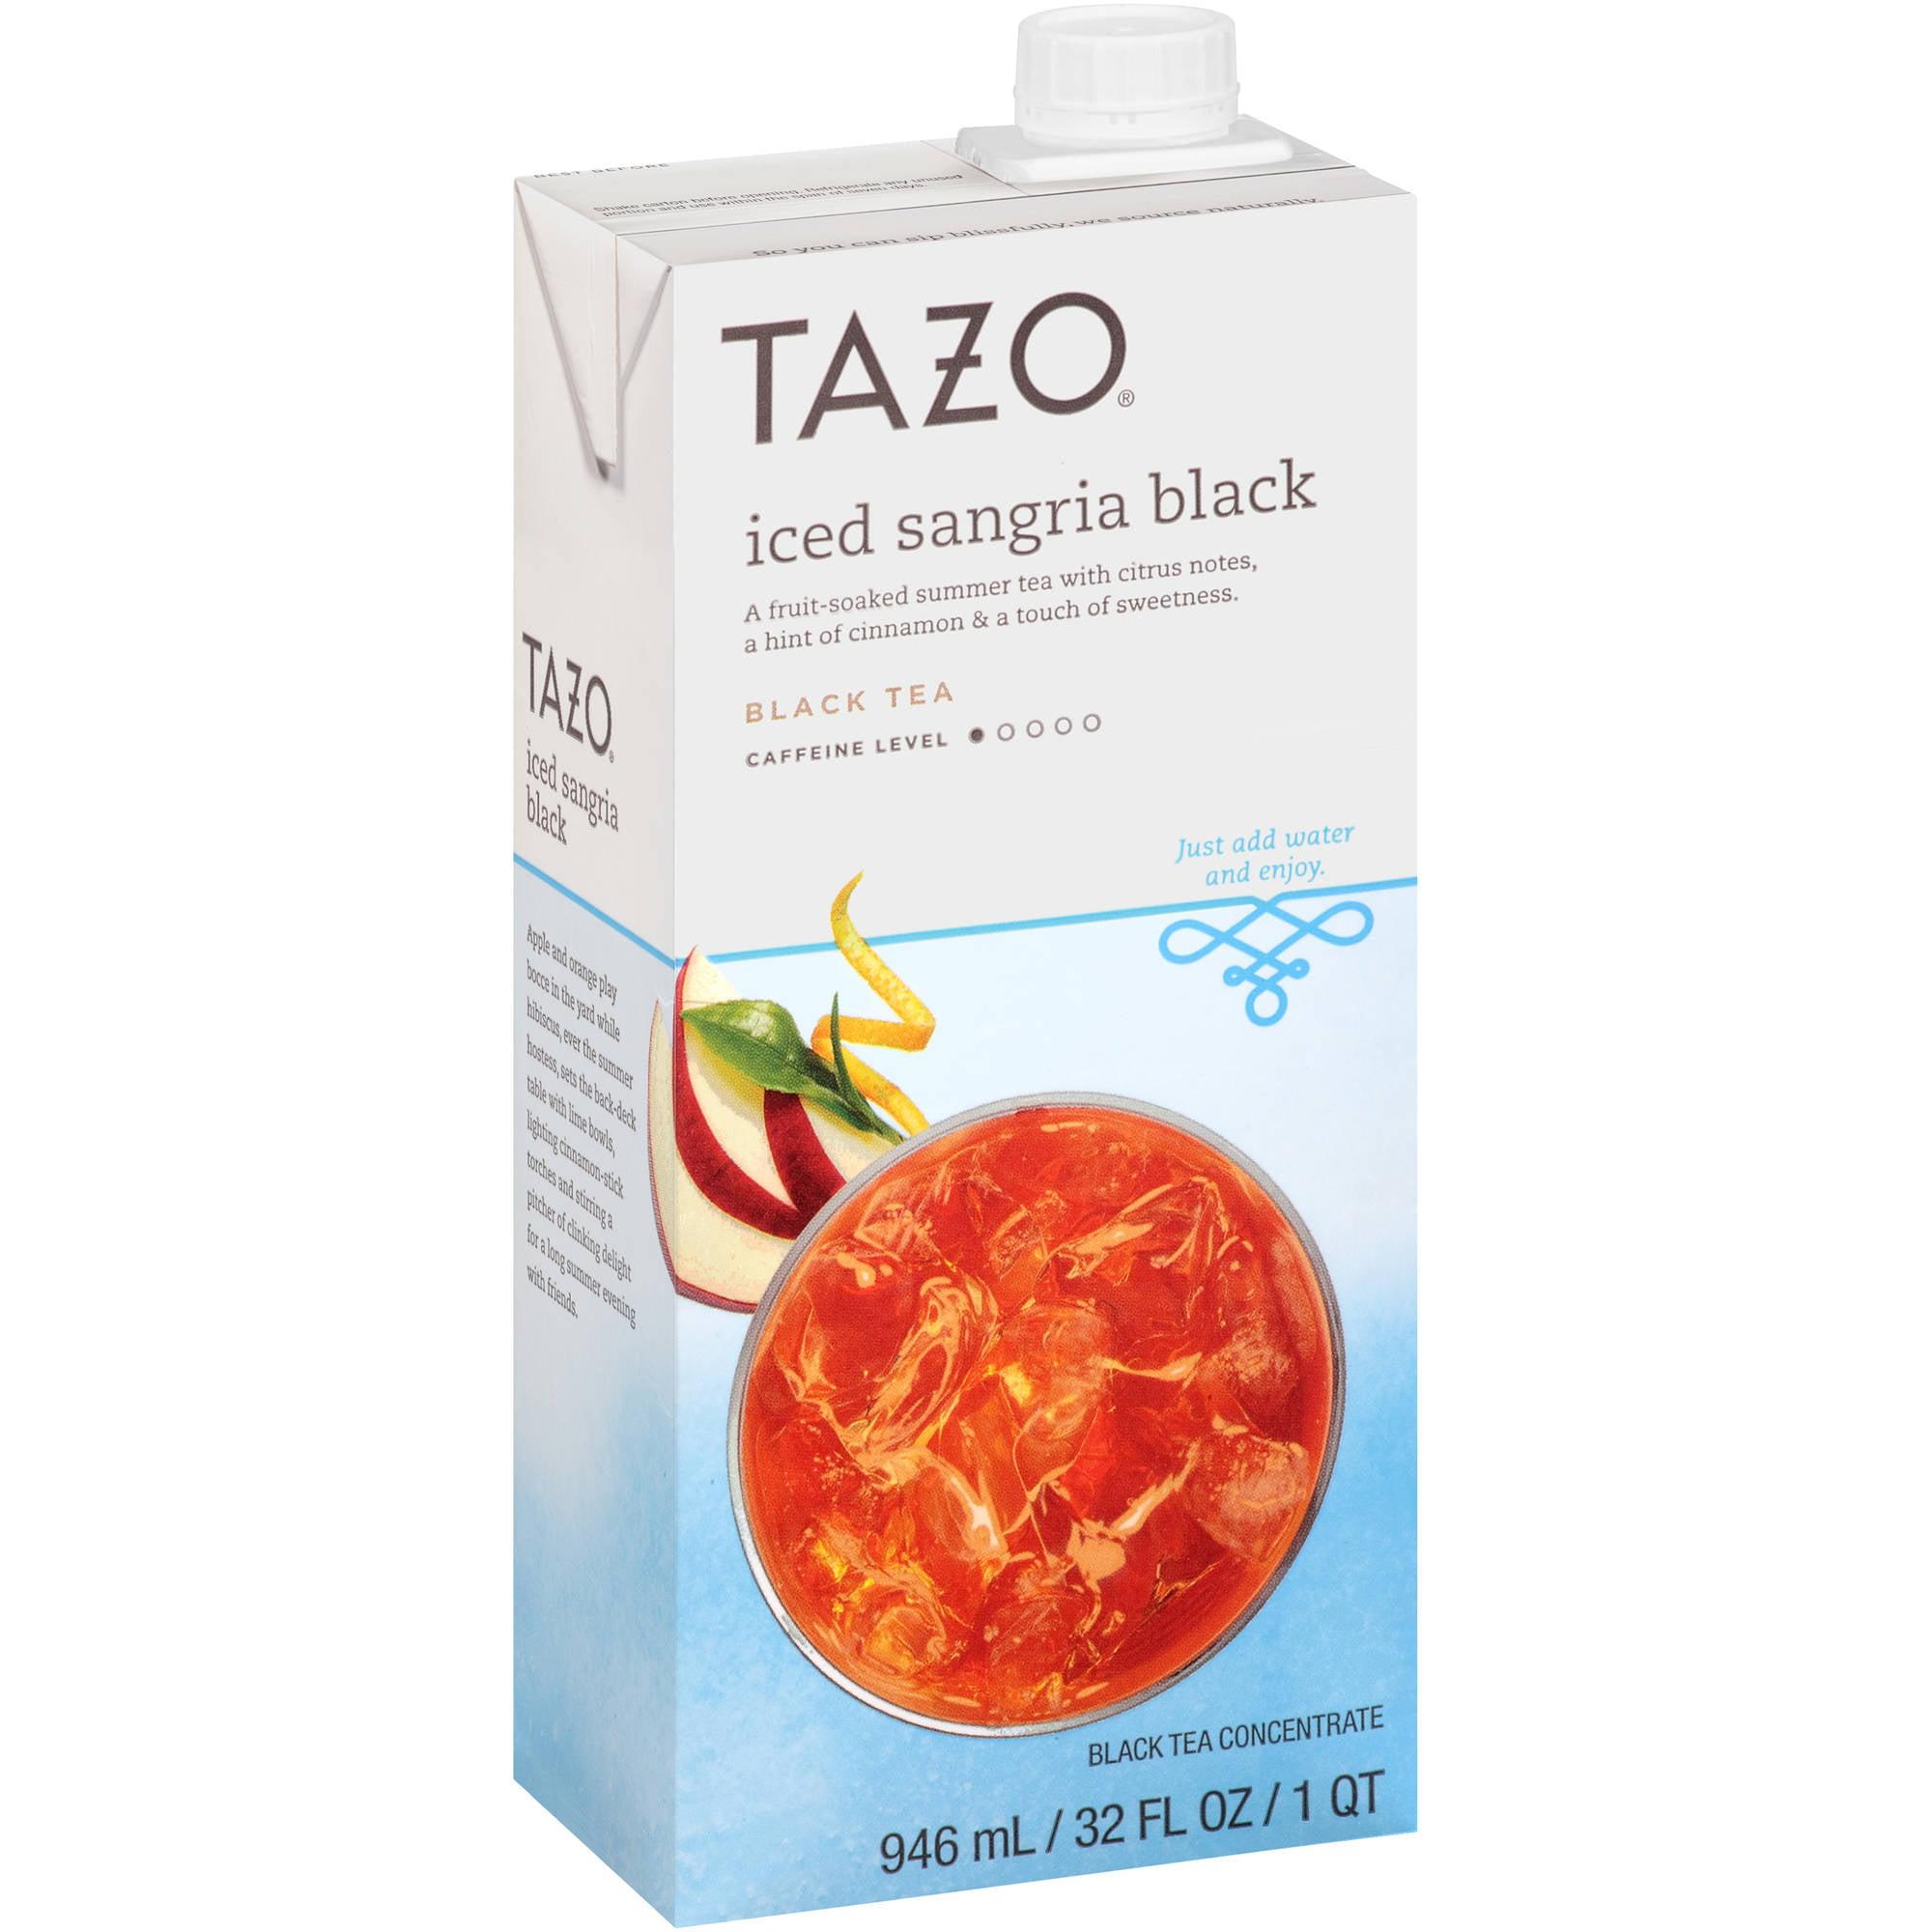 Tazo Iced Sangria Black Tea Concentrate, 32 fl oz